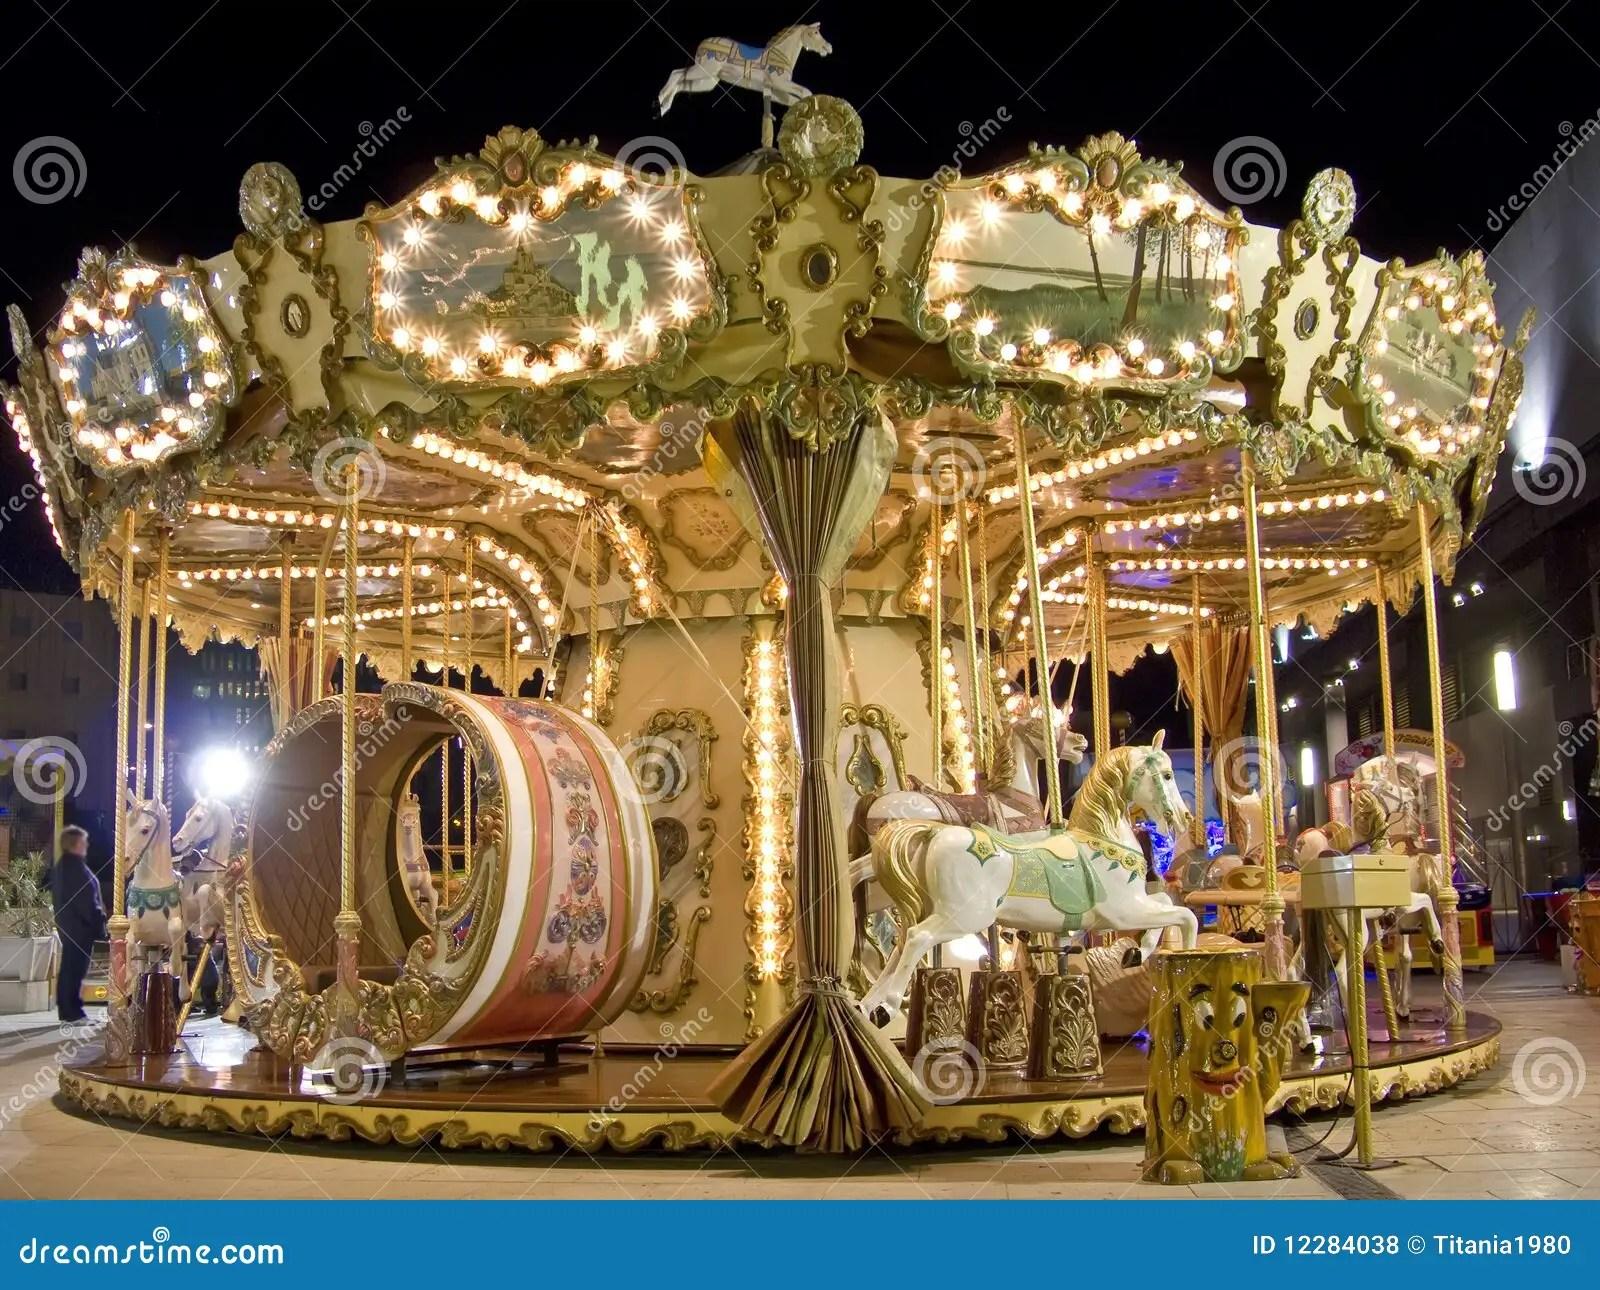 Carousel At Night Royalty Free Stock Photos Image 12284038